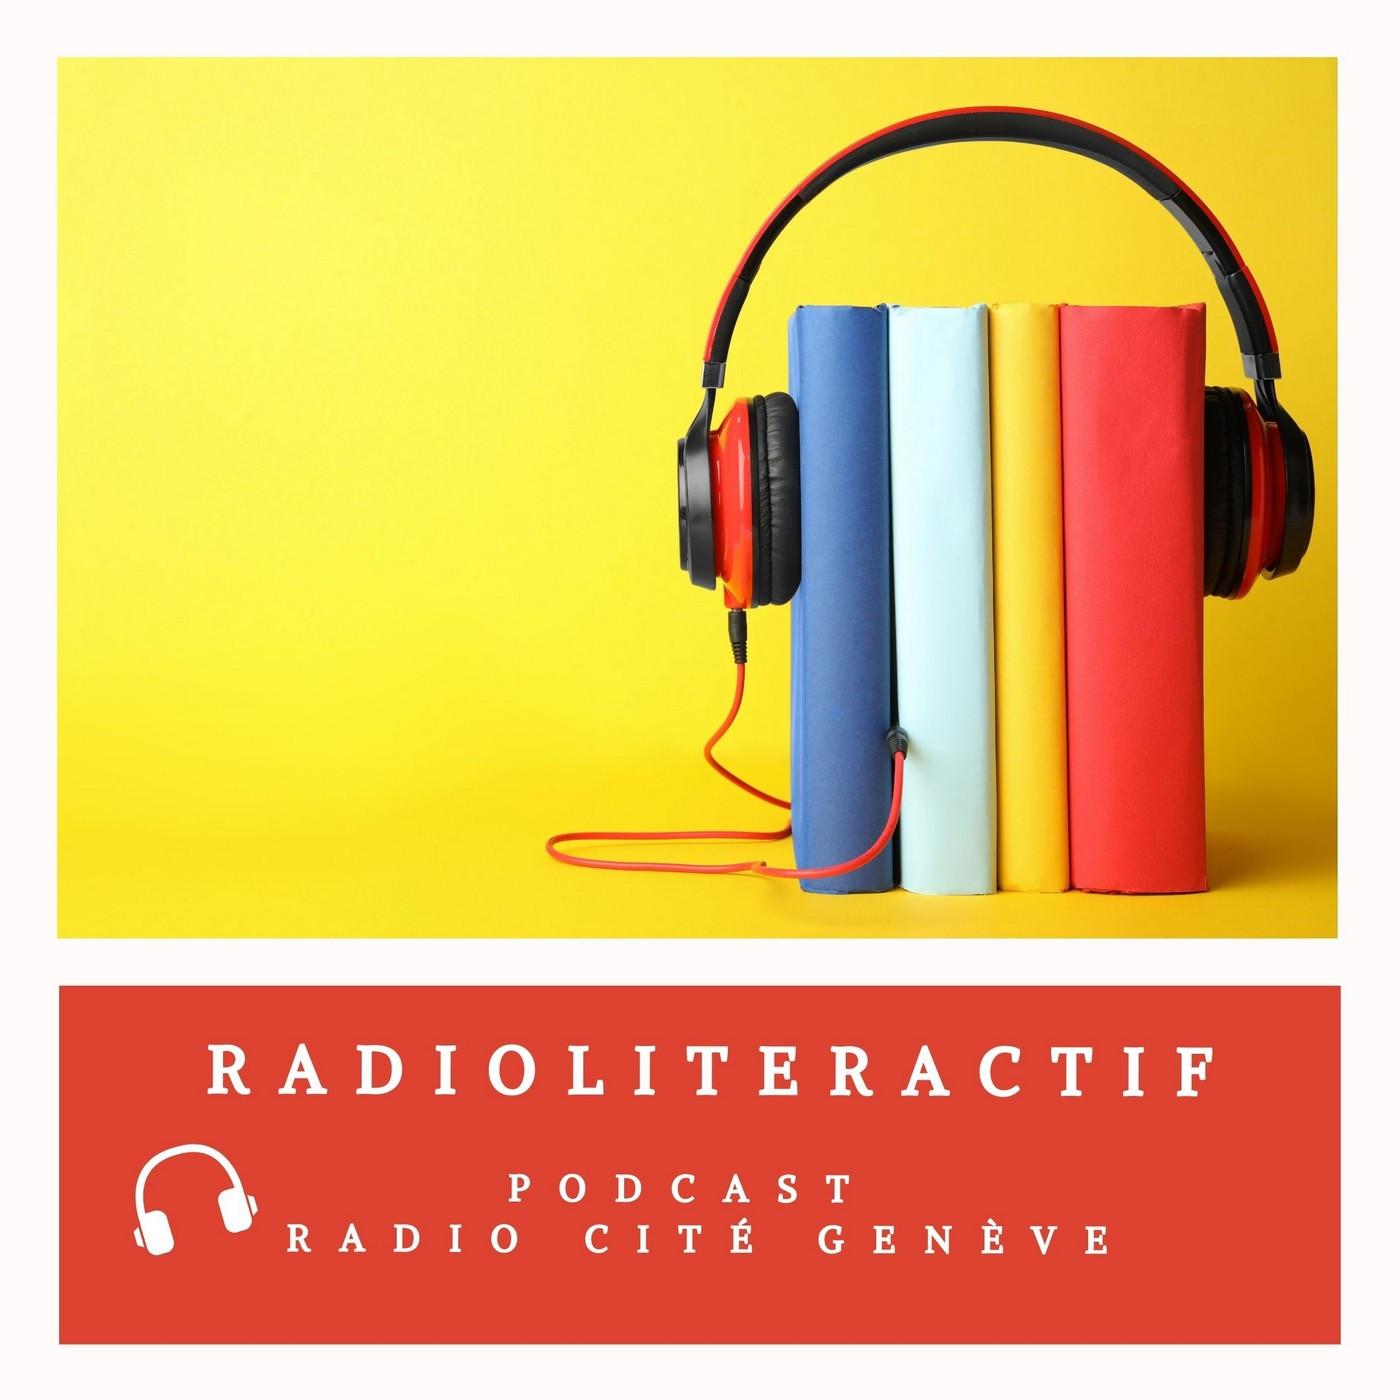 Radioliteractif du 30/11/20 - Barrigue  «Covid ton sac»